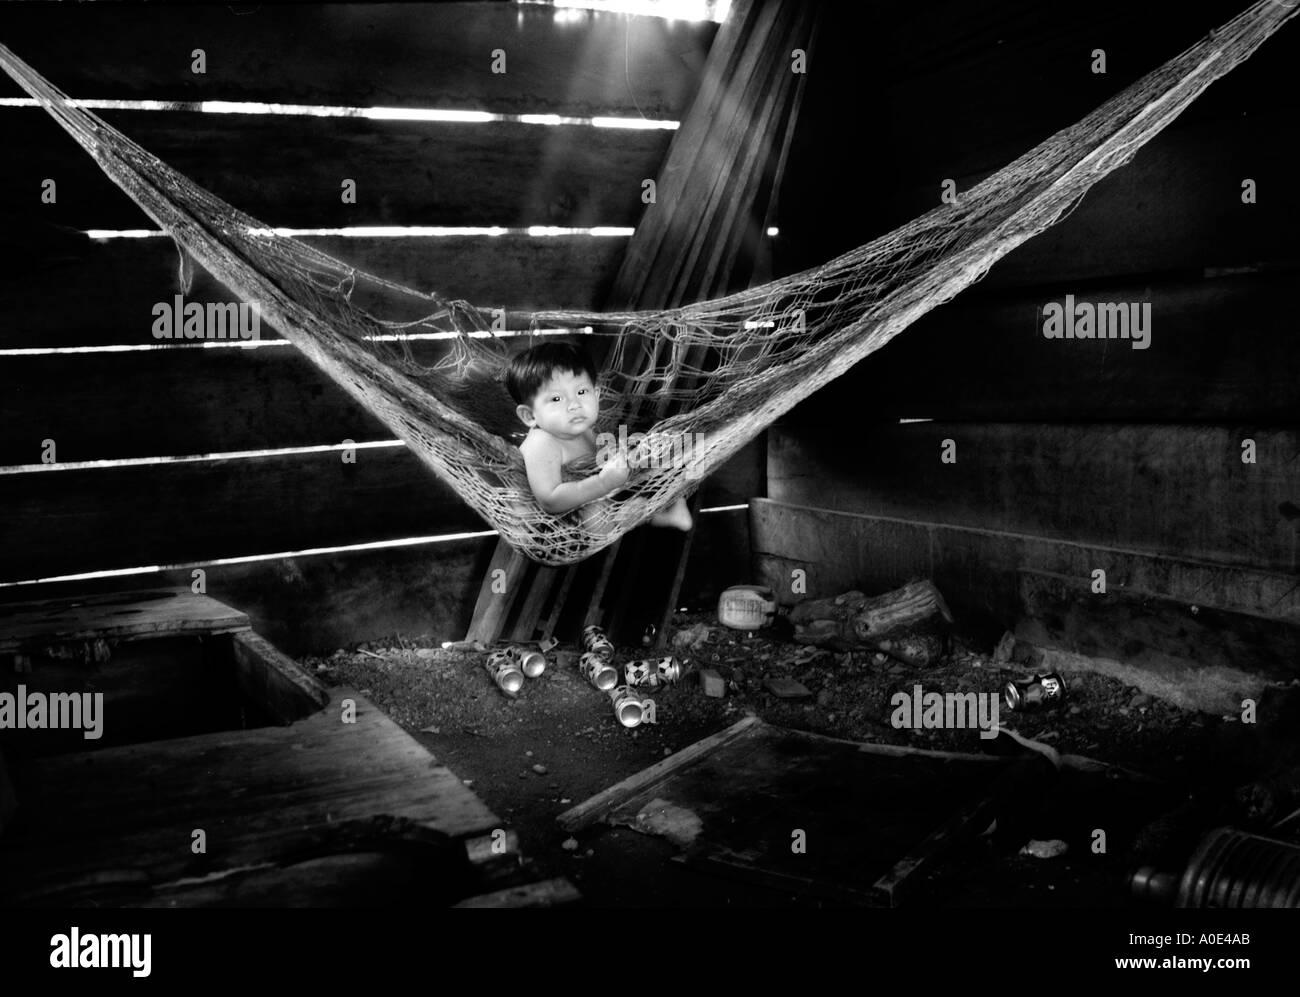 Baby alone in hammock Puerto Barrios Guatemala - Stock Image